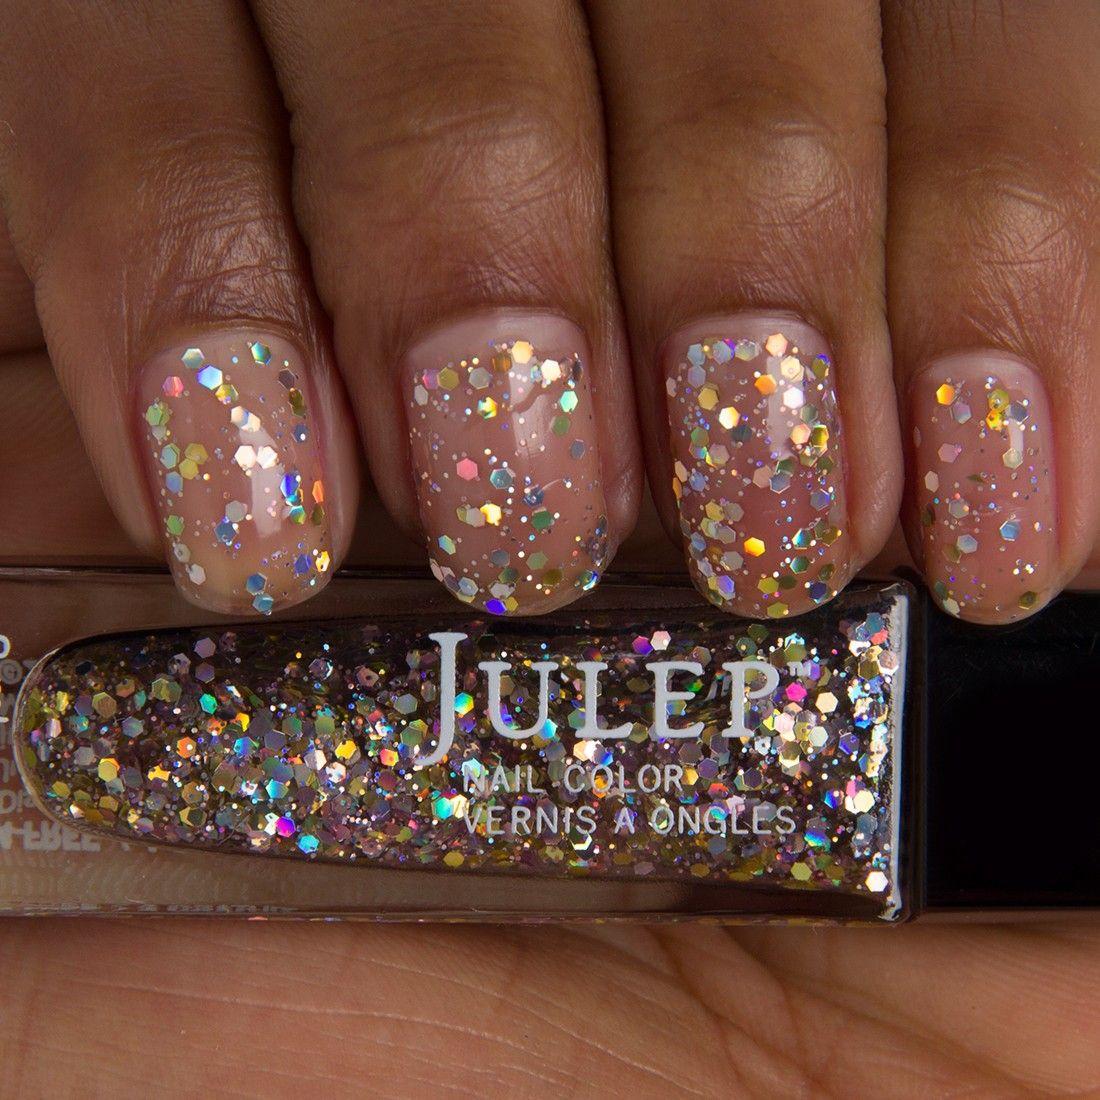 Julep - Paris | Other Nail Polish I Own | Pinterest | Nail polish ...